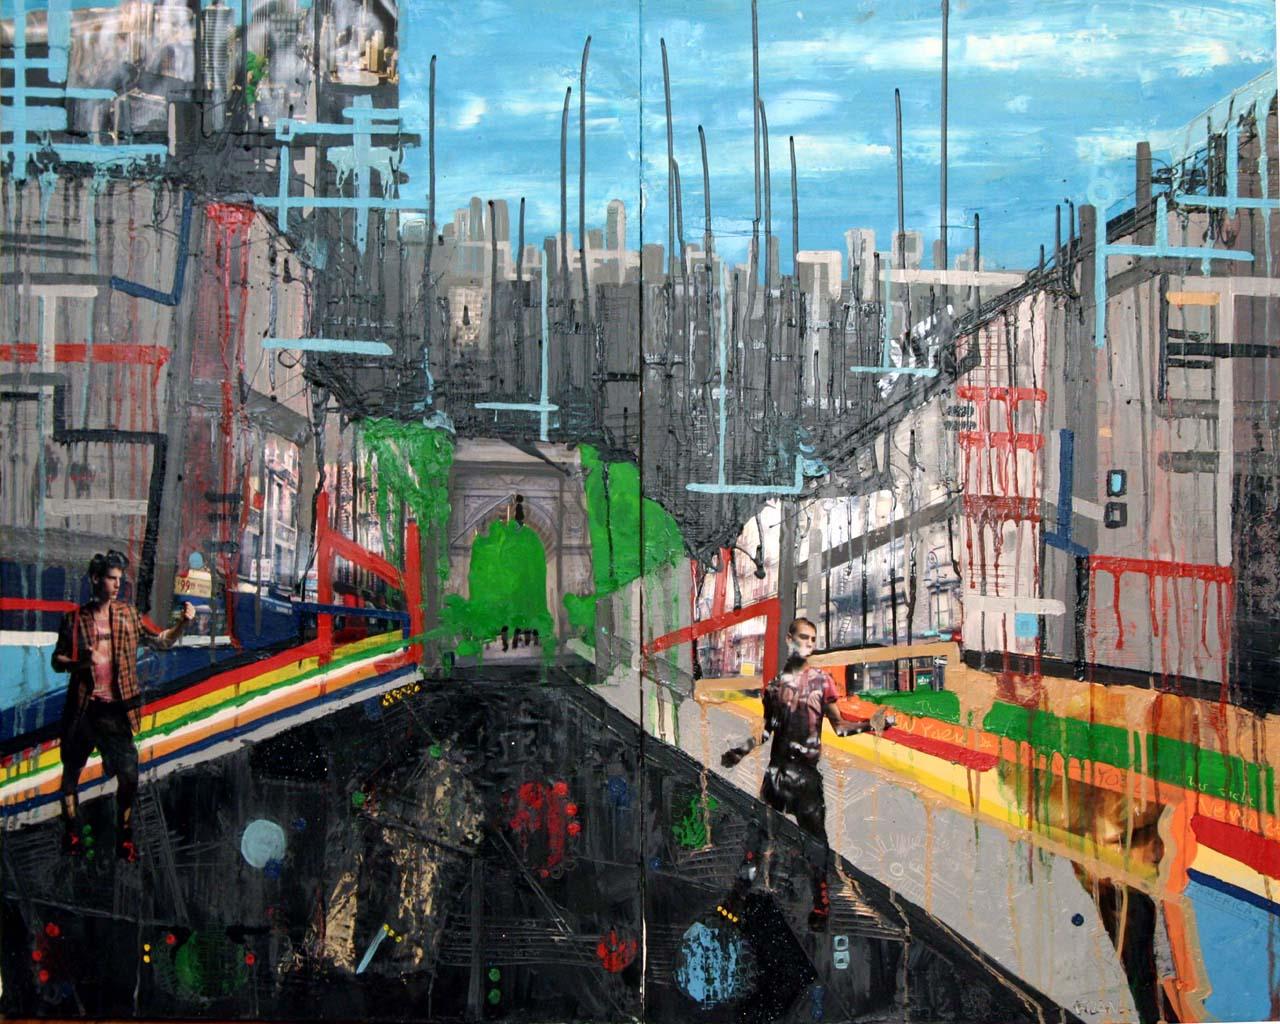 Urban Hip, 2006, Oil on canvas, 36 x 48 inches